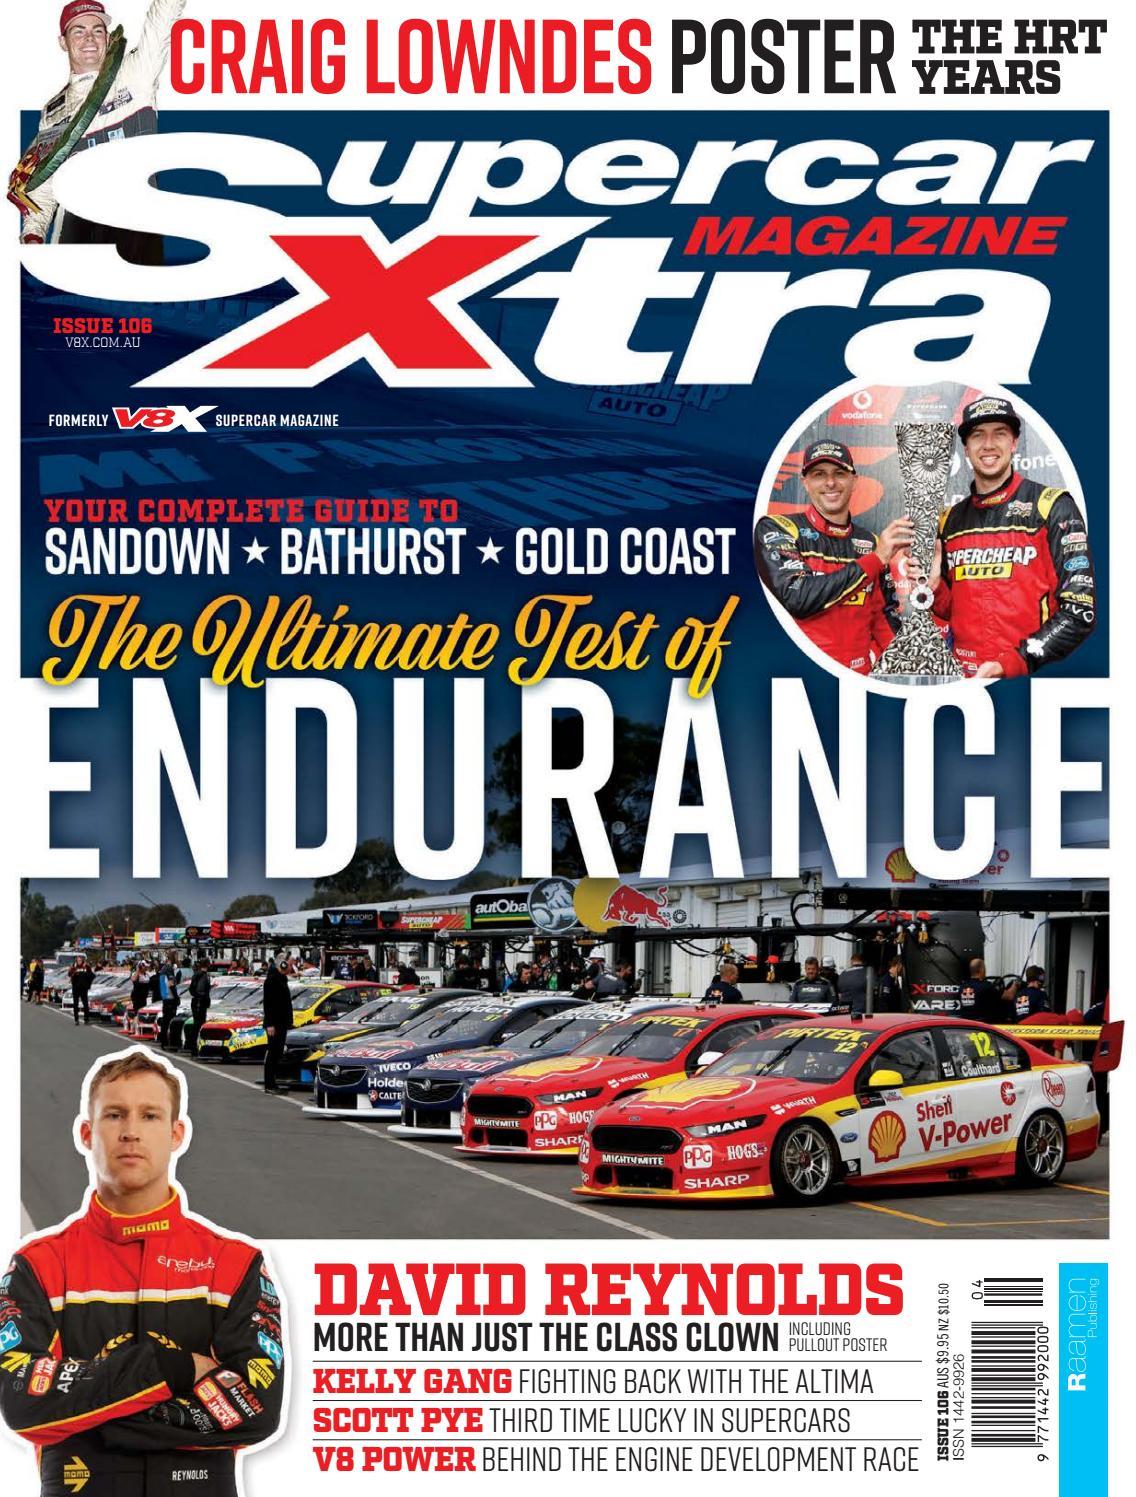 Castrol Racing Super Team Poster 97 Larry Perkins Russell Ingall Tony Longhurst